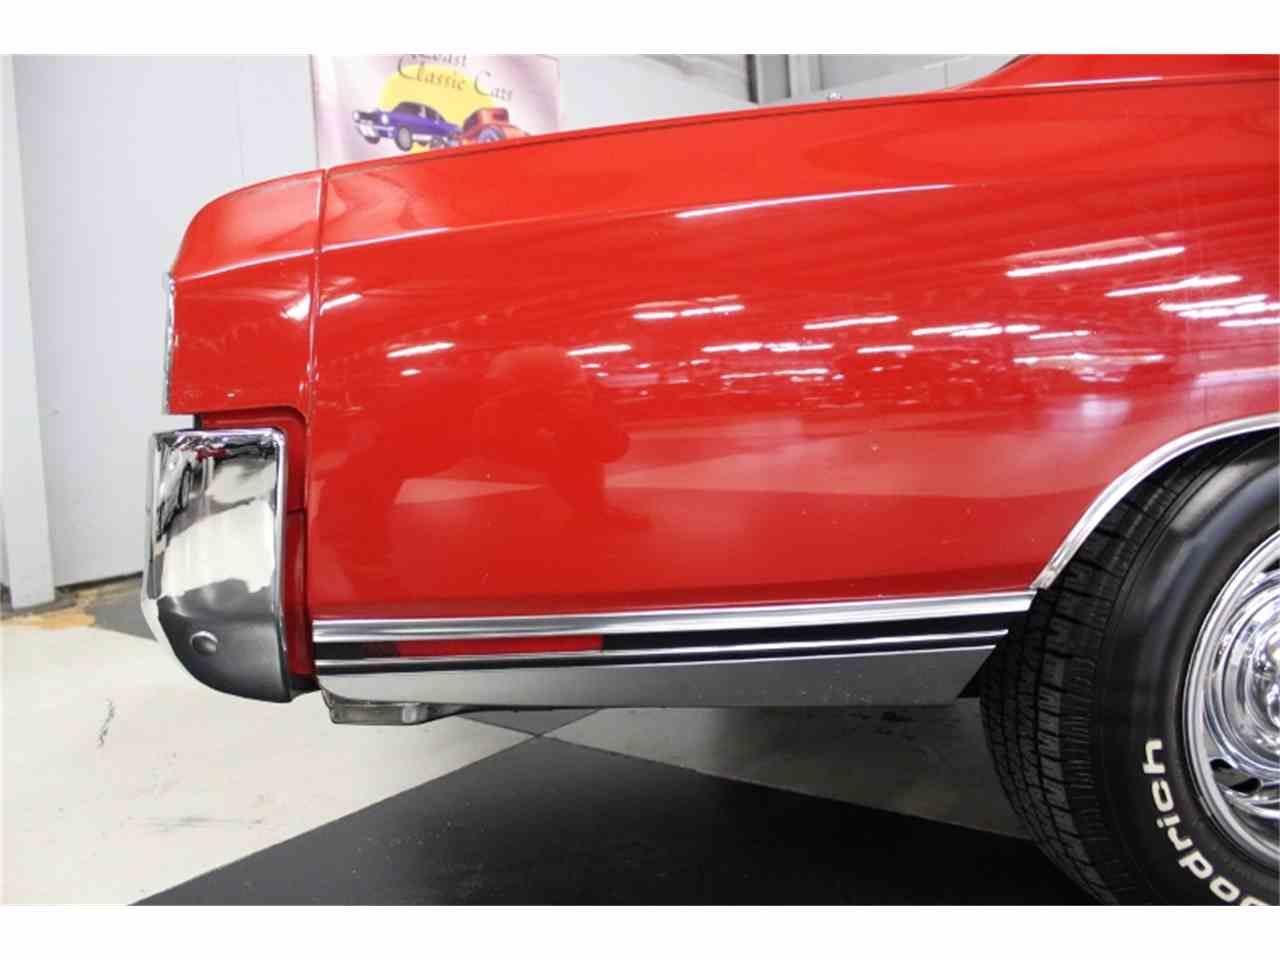 1972 Chevrolet Monte Carlo for Sale | ClassicCars.com | CC-1051418